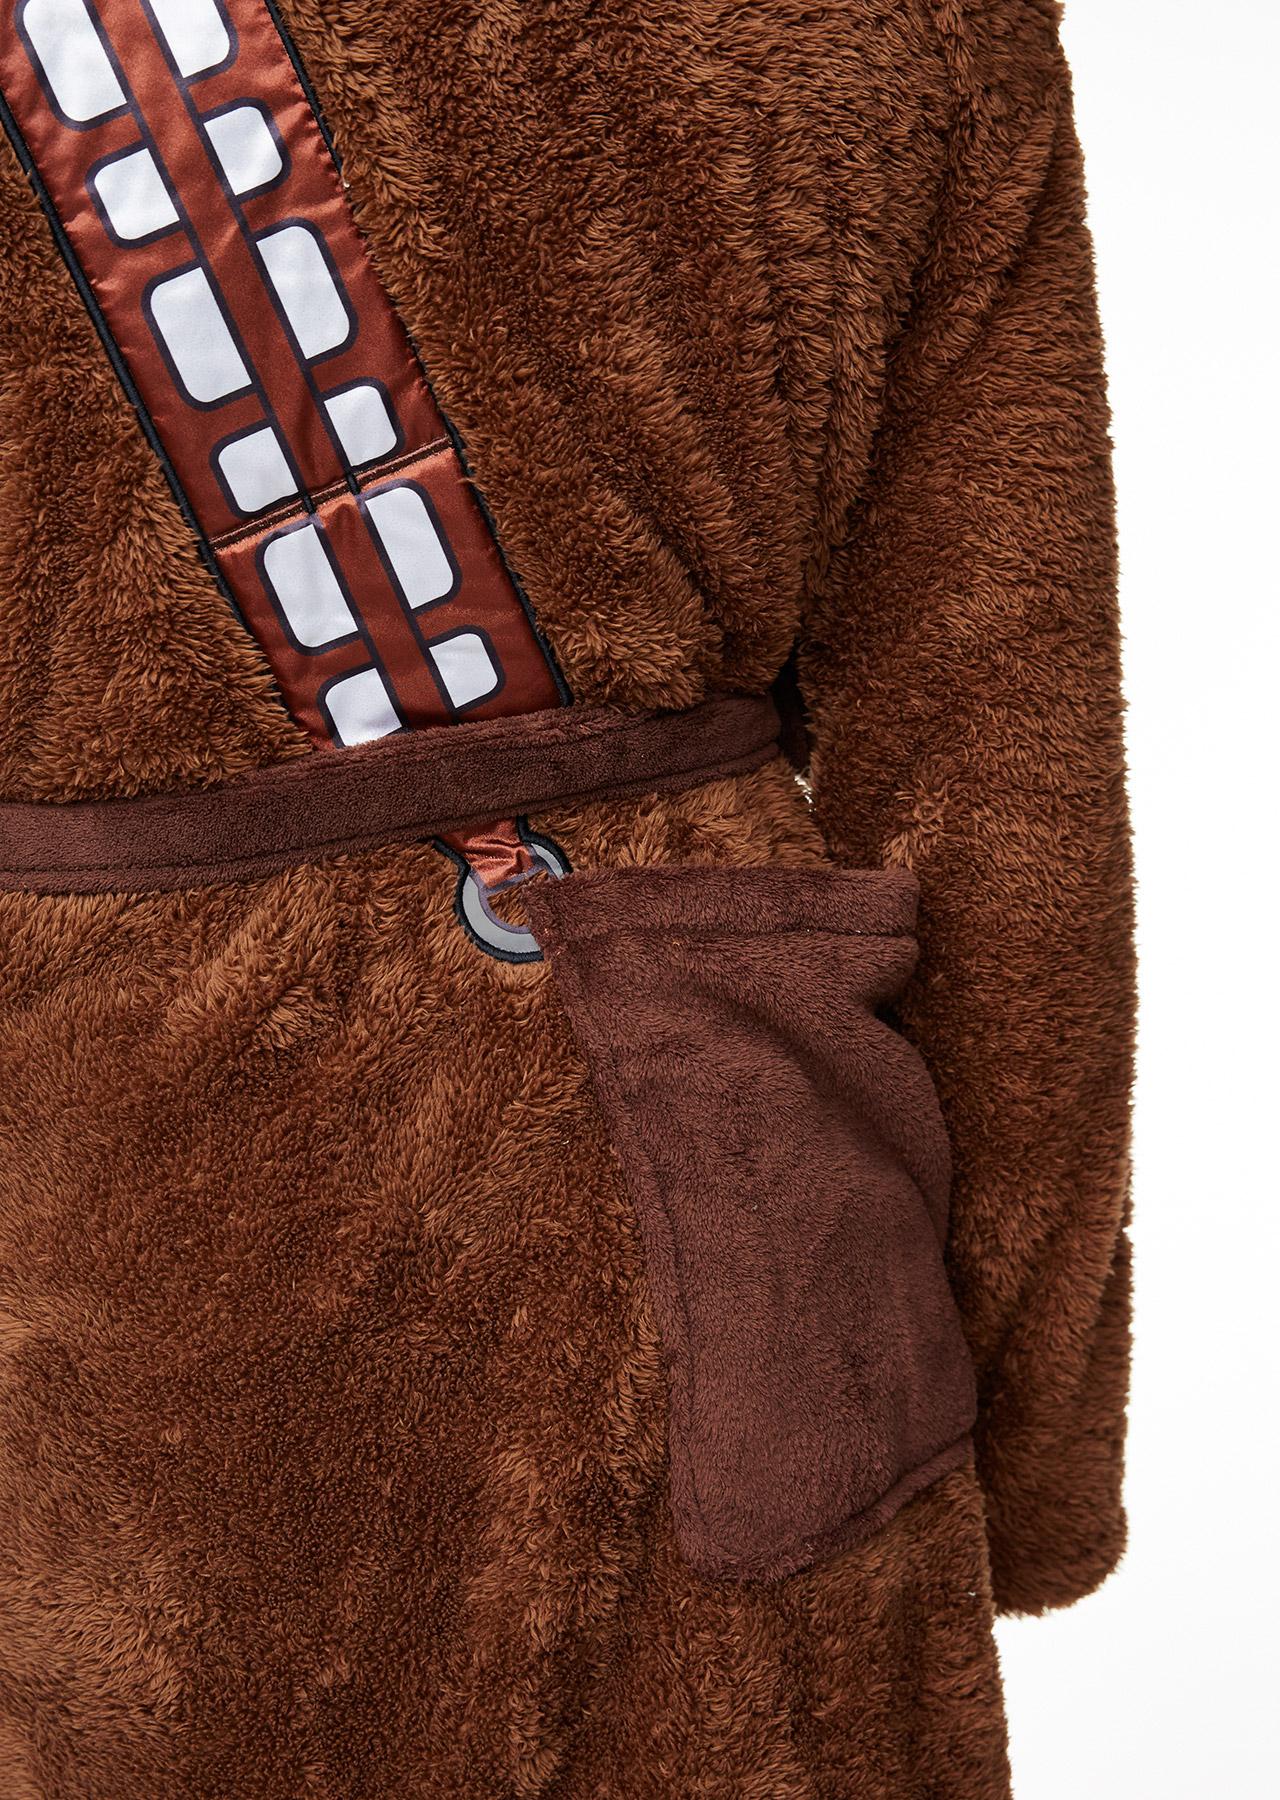 Star Wars Chewbacca Adult Fleece Bathrobe – Groovy UK